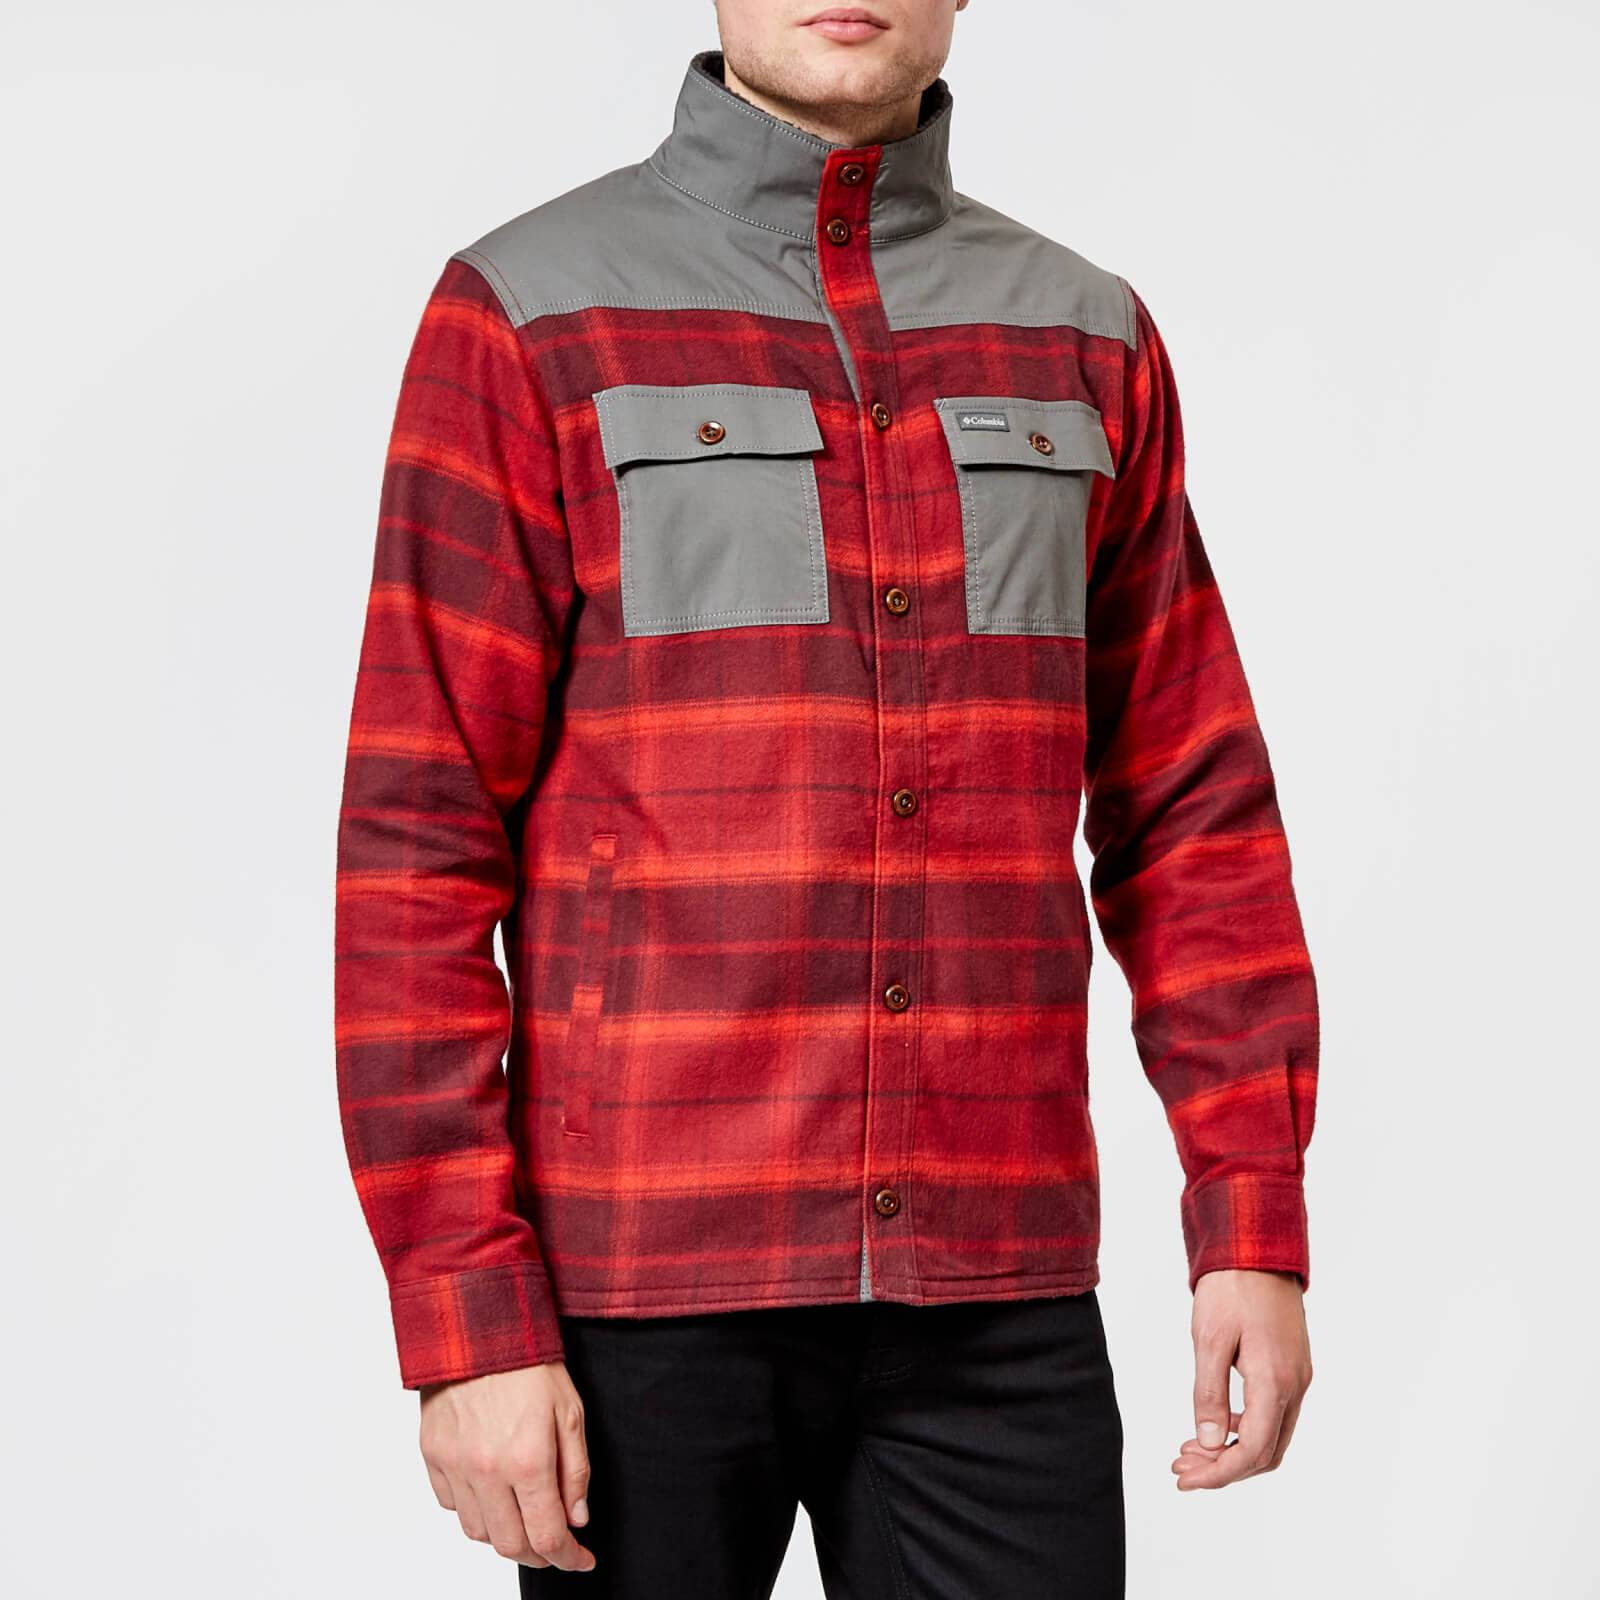 Columbia Men's Deschutes River Shirt Jacket - Rusty Large Plaid - XL - Multi